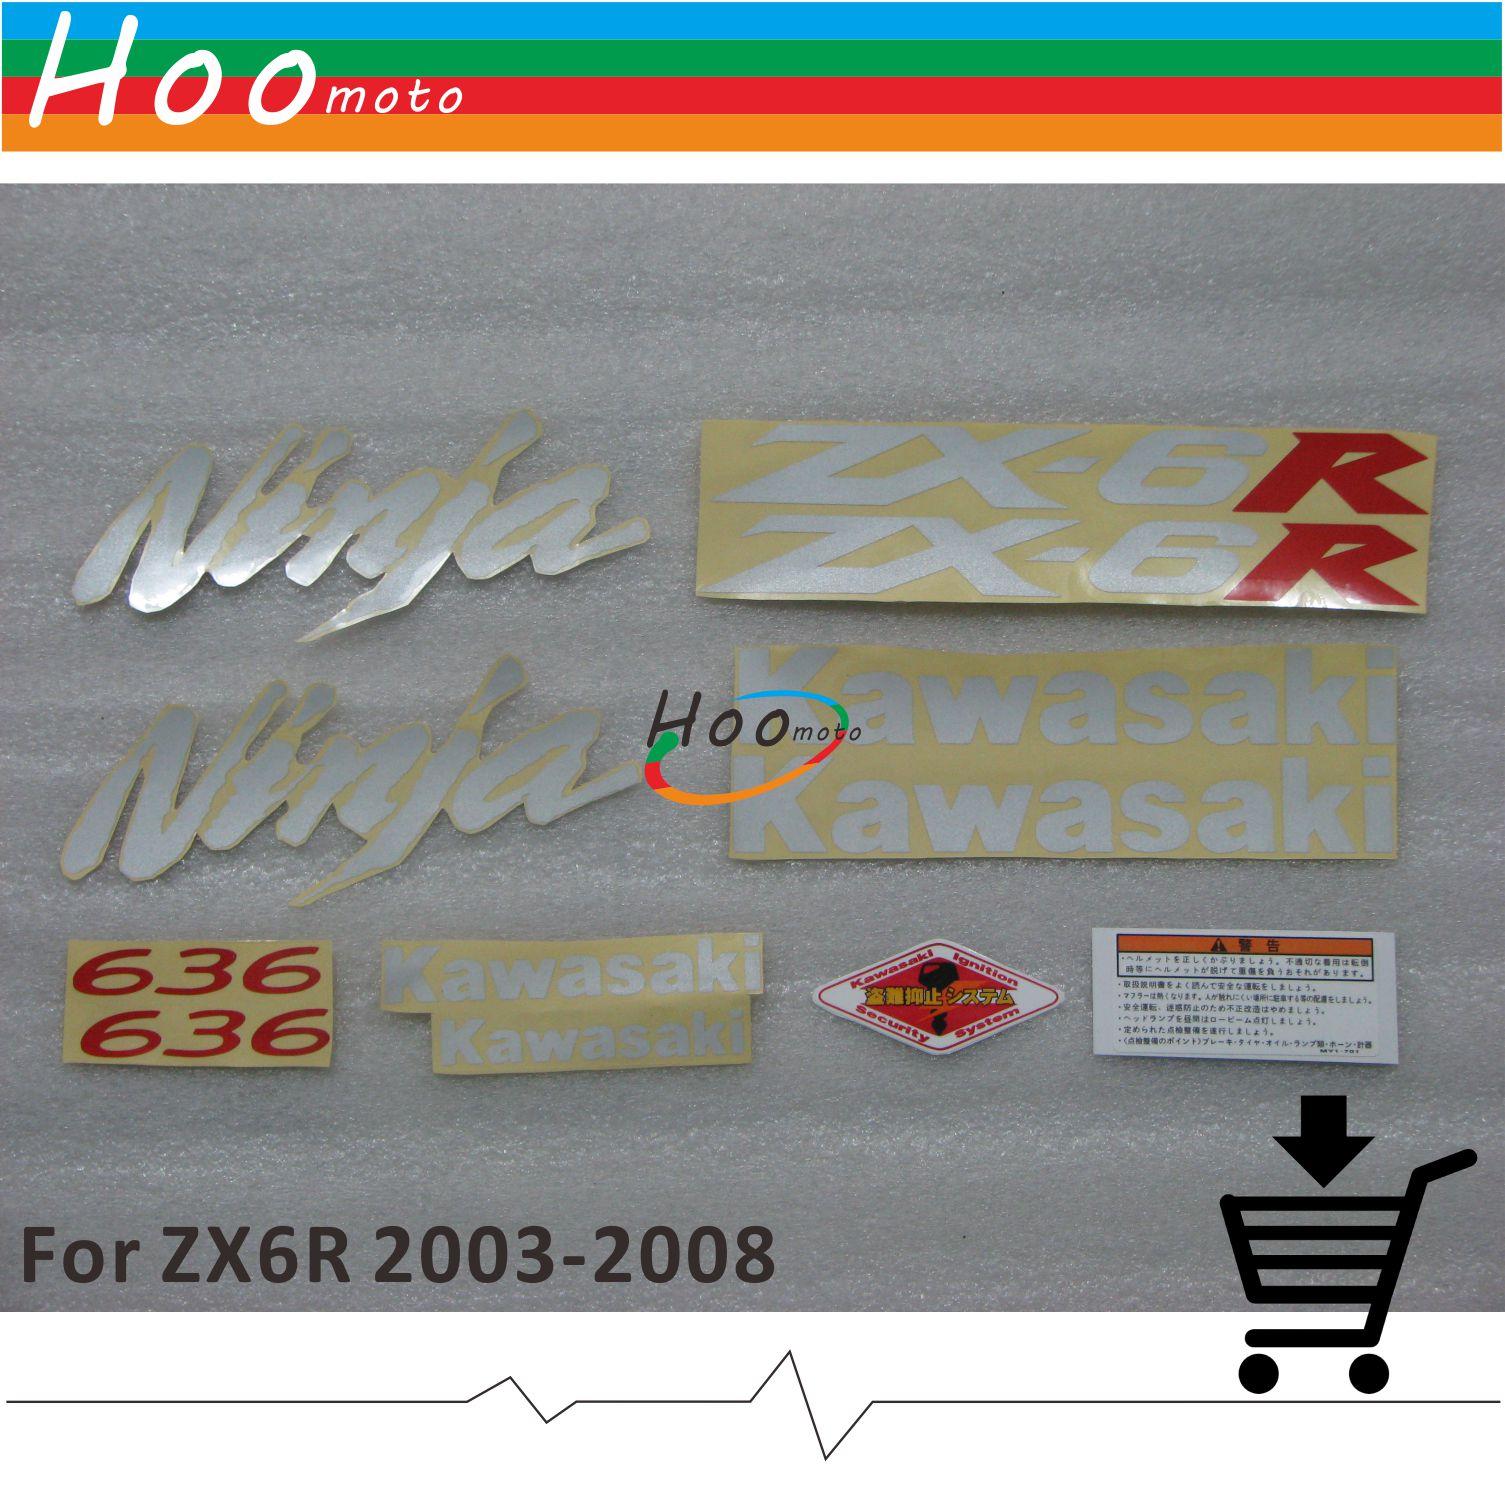 Silver zx6r 2006 ninja full decals sticker graphics set kit 636 motorcycle car for kawasaki zx 6r 03 04 05 06 07 08 z qg k 06b